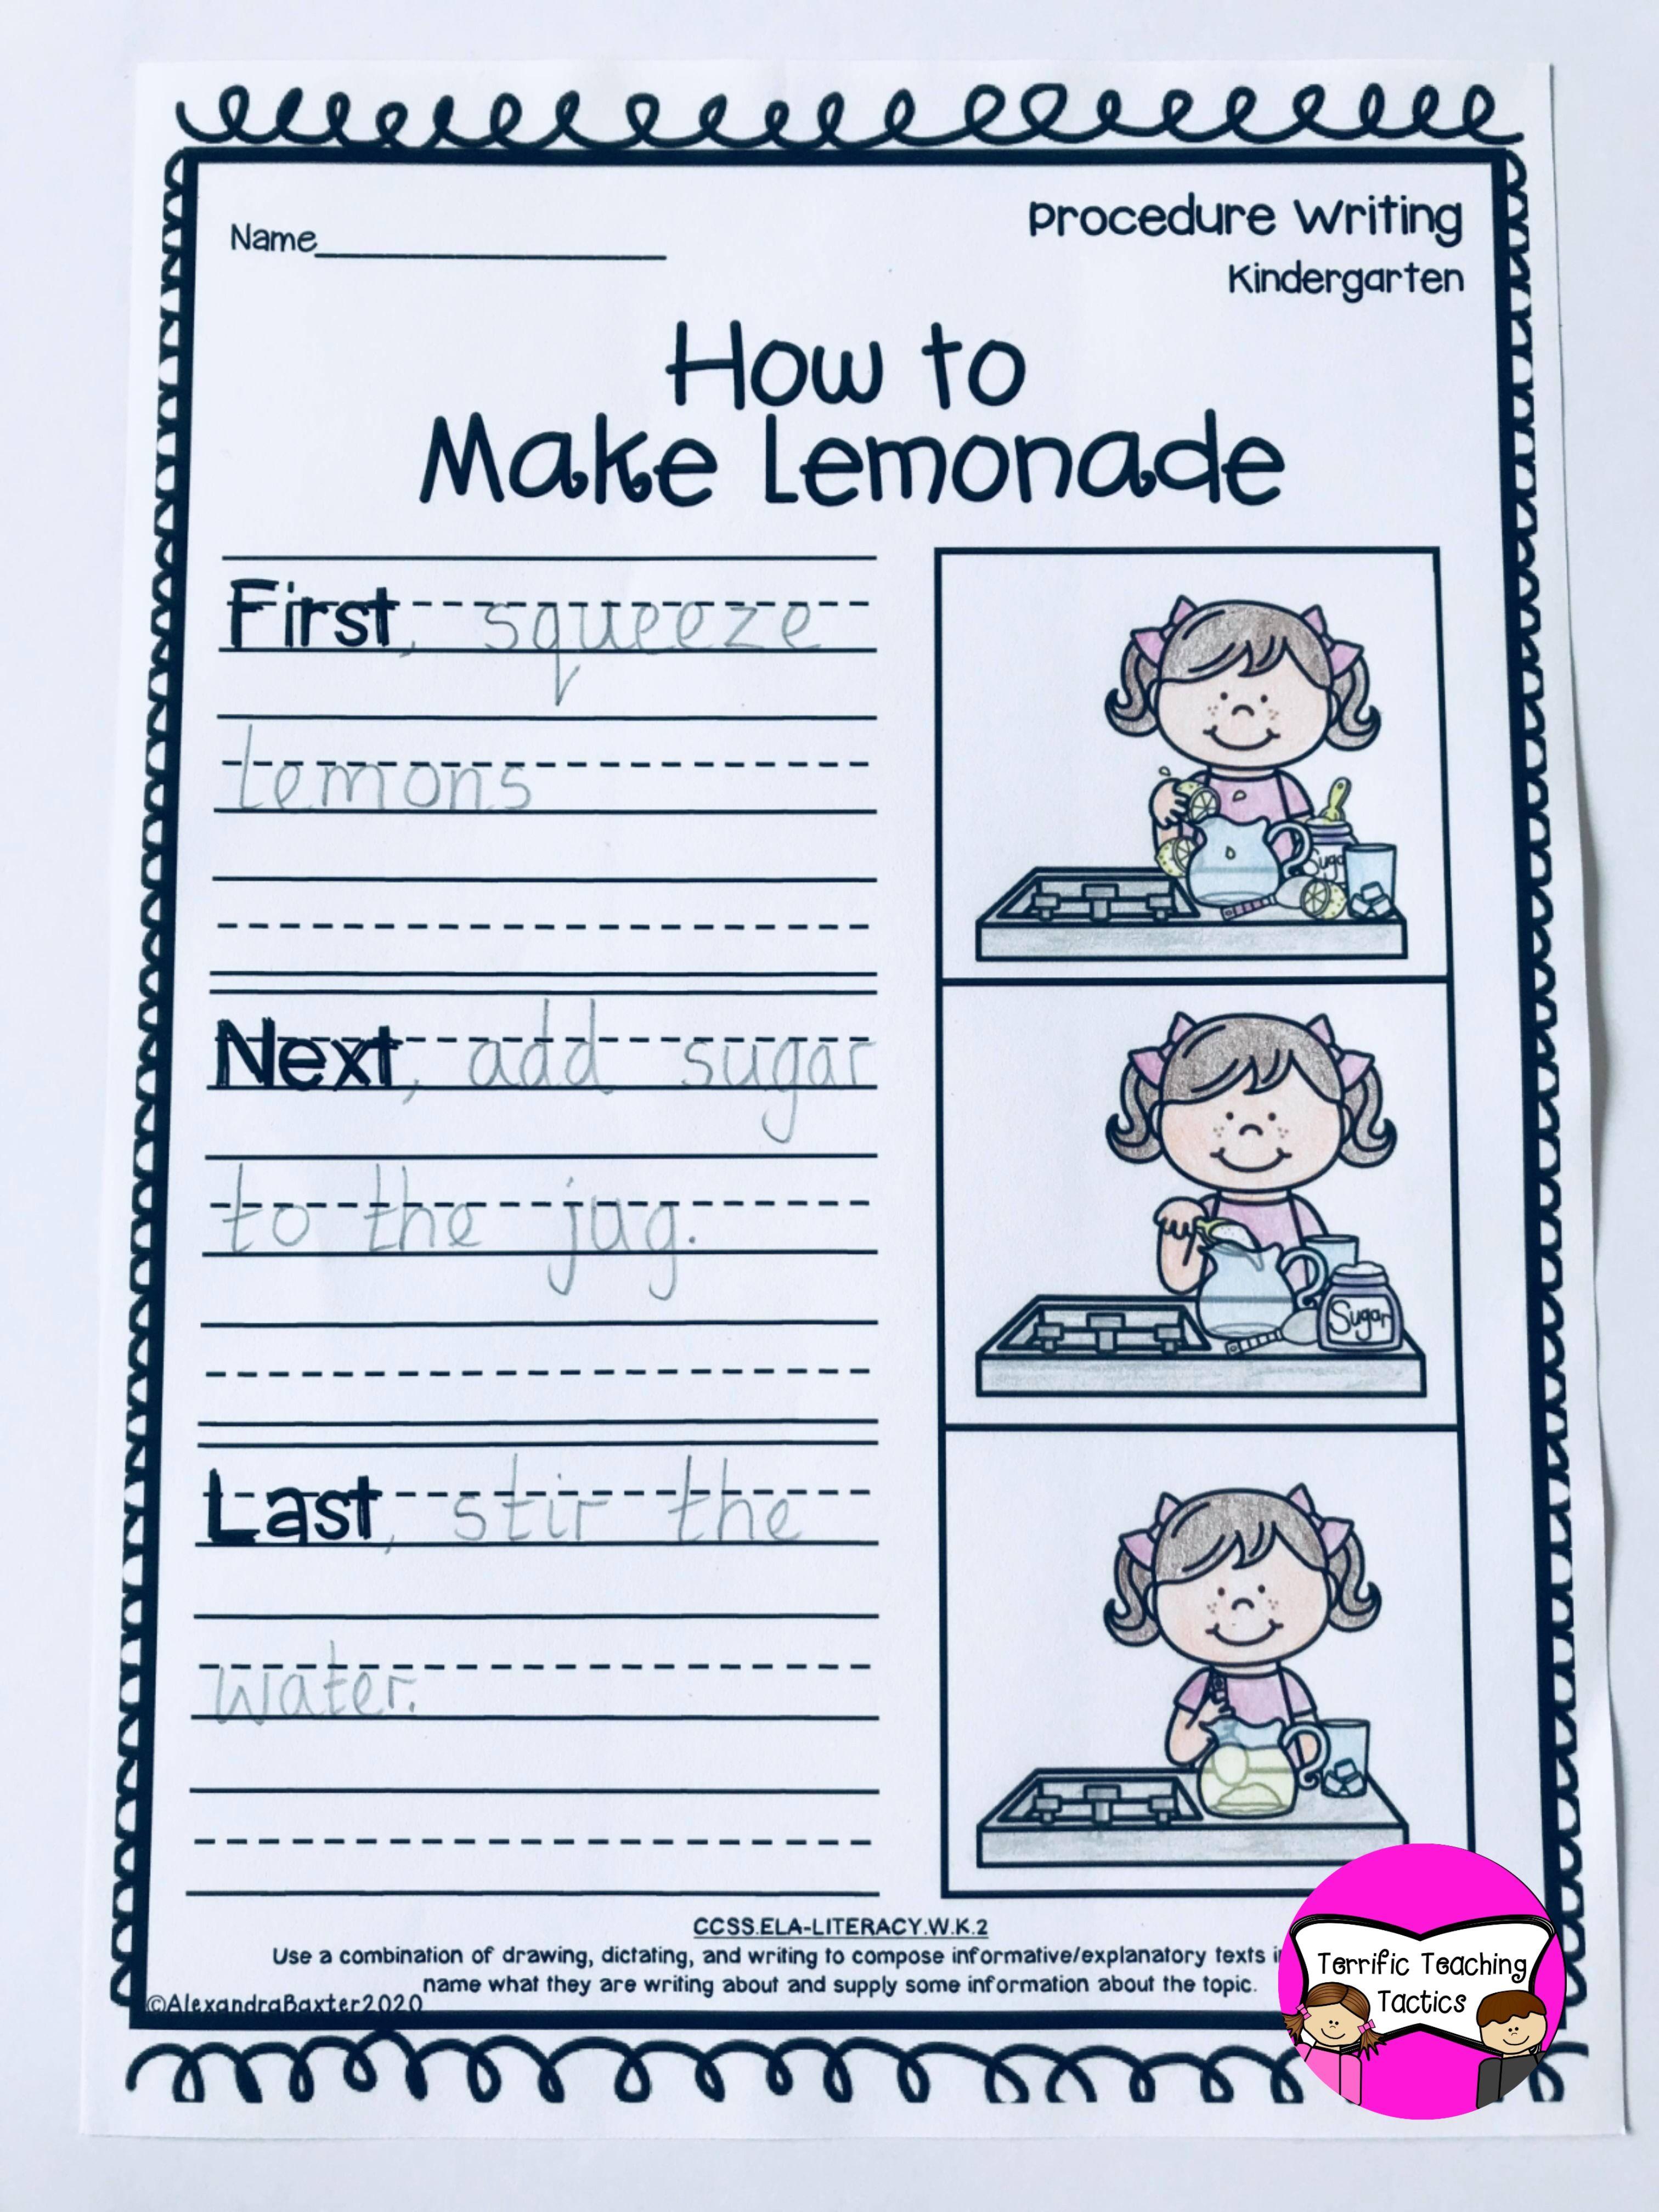 How to Make Lemonade Worksheet   Procedural writing [ 4032 x 3024 Pixel ]